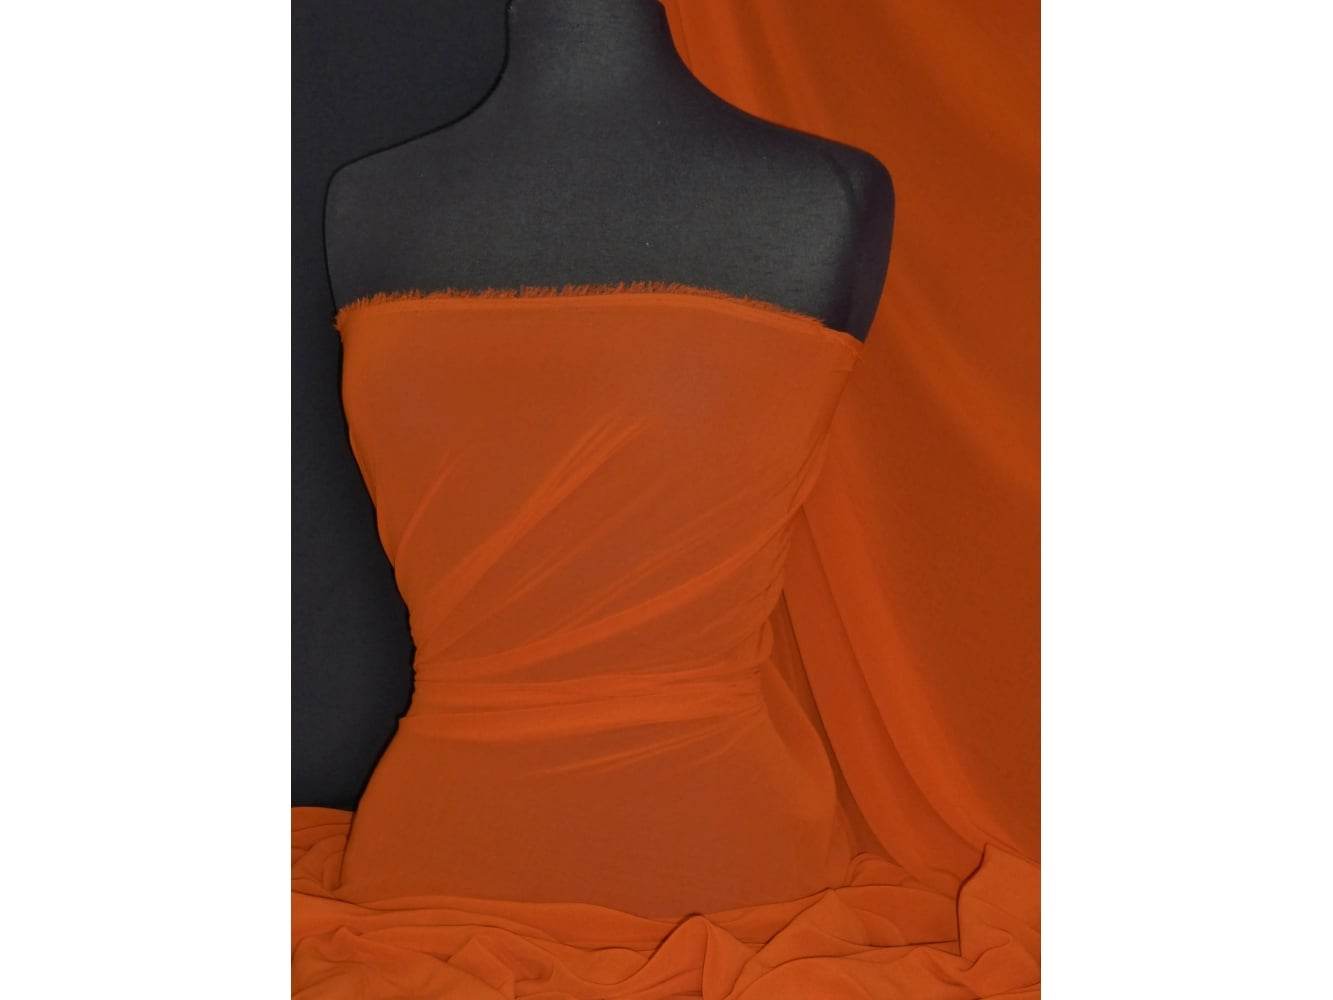 Crinkle Sheer Chiffon Material- Burnt Orange Q795 BNOR